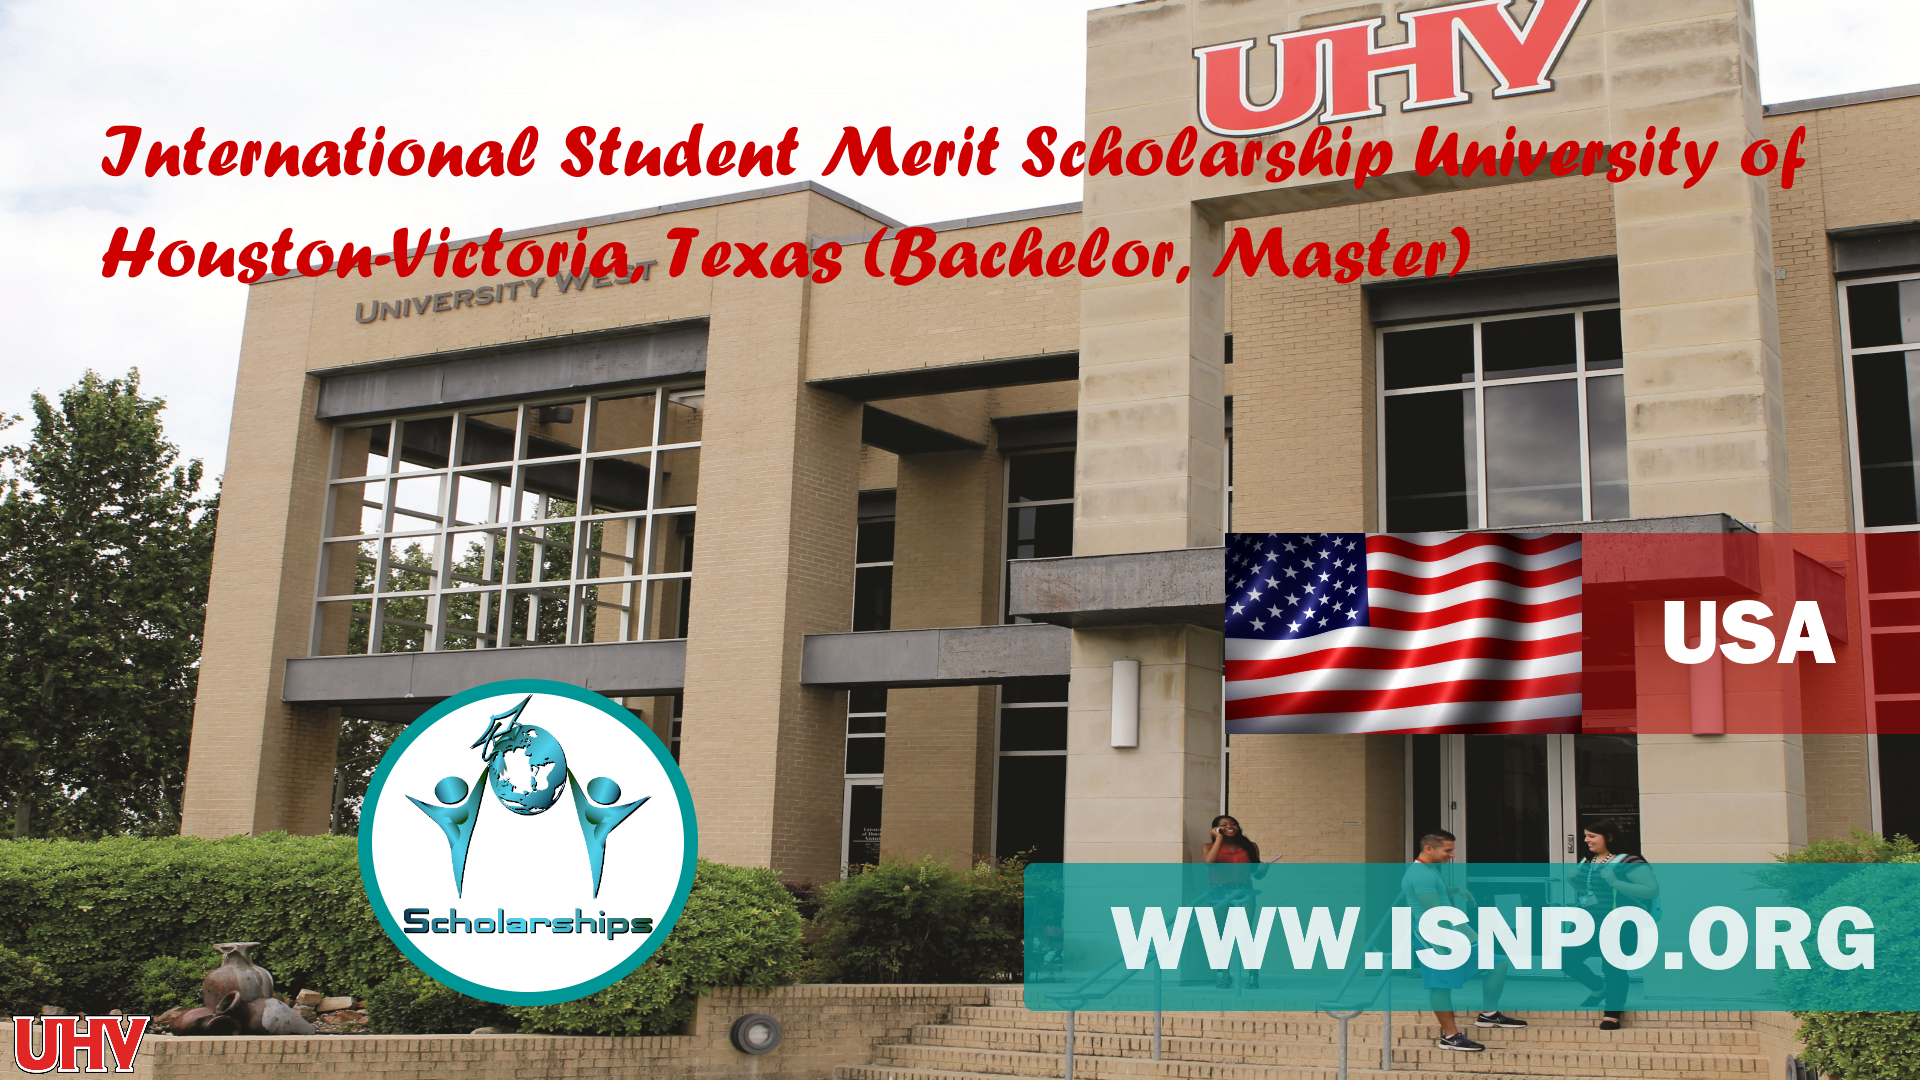 International Trainee Benefit Scholarship University of Houston-Victoria, Texas